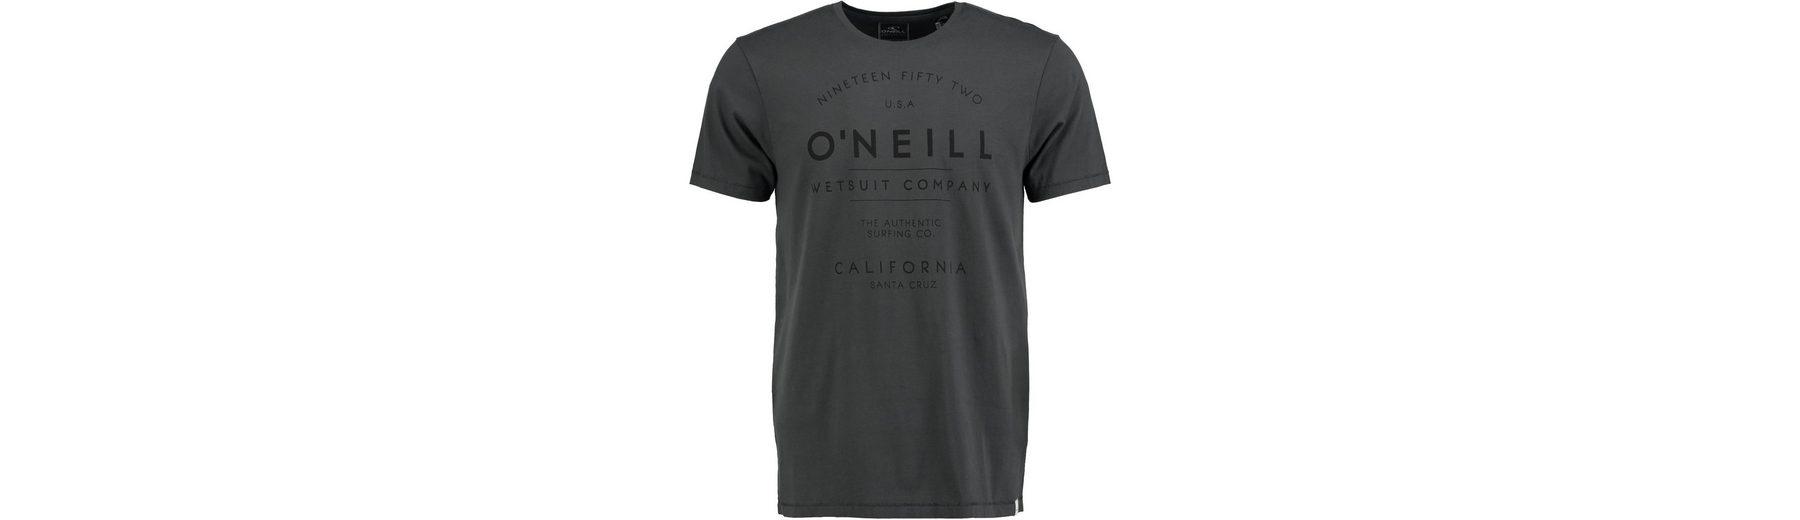 T Shirt Type kurz盲rmlig O'Neill O'Neill T Shirt tqwzvIv